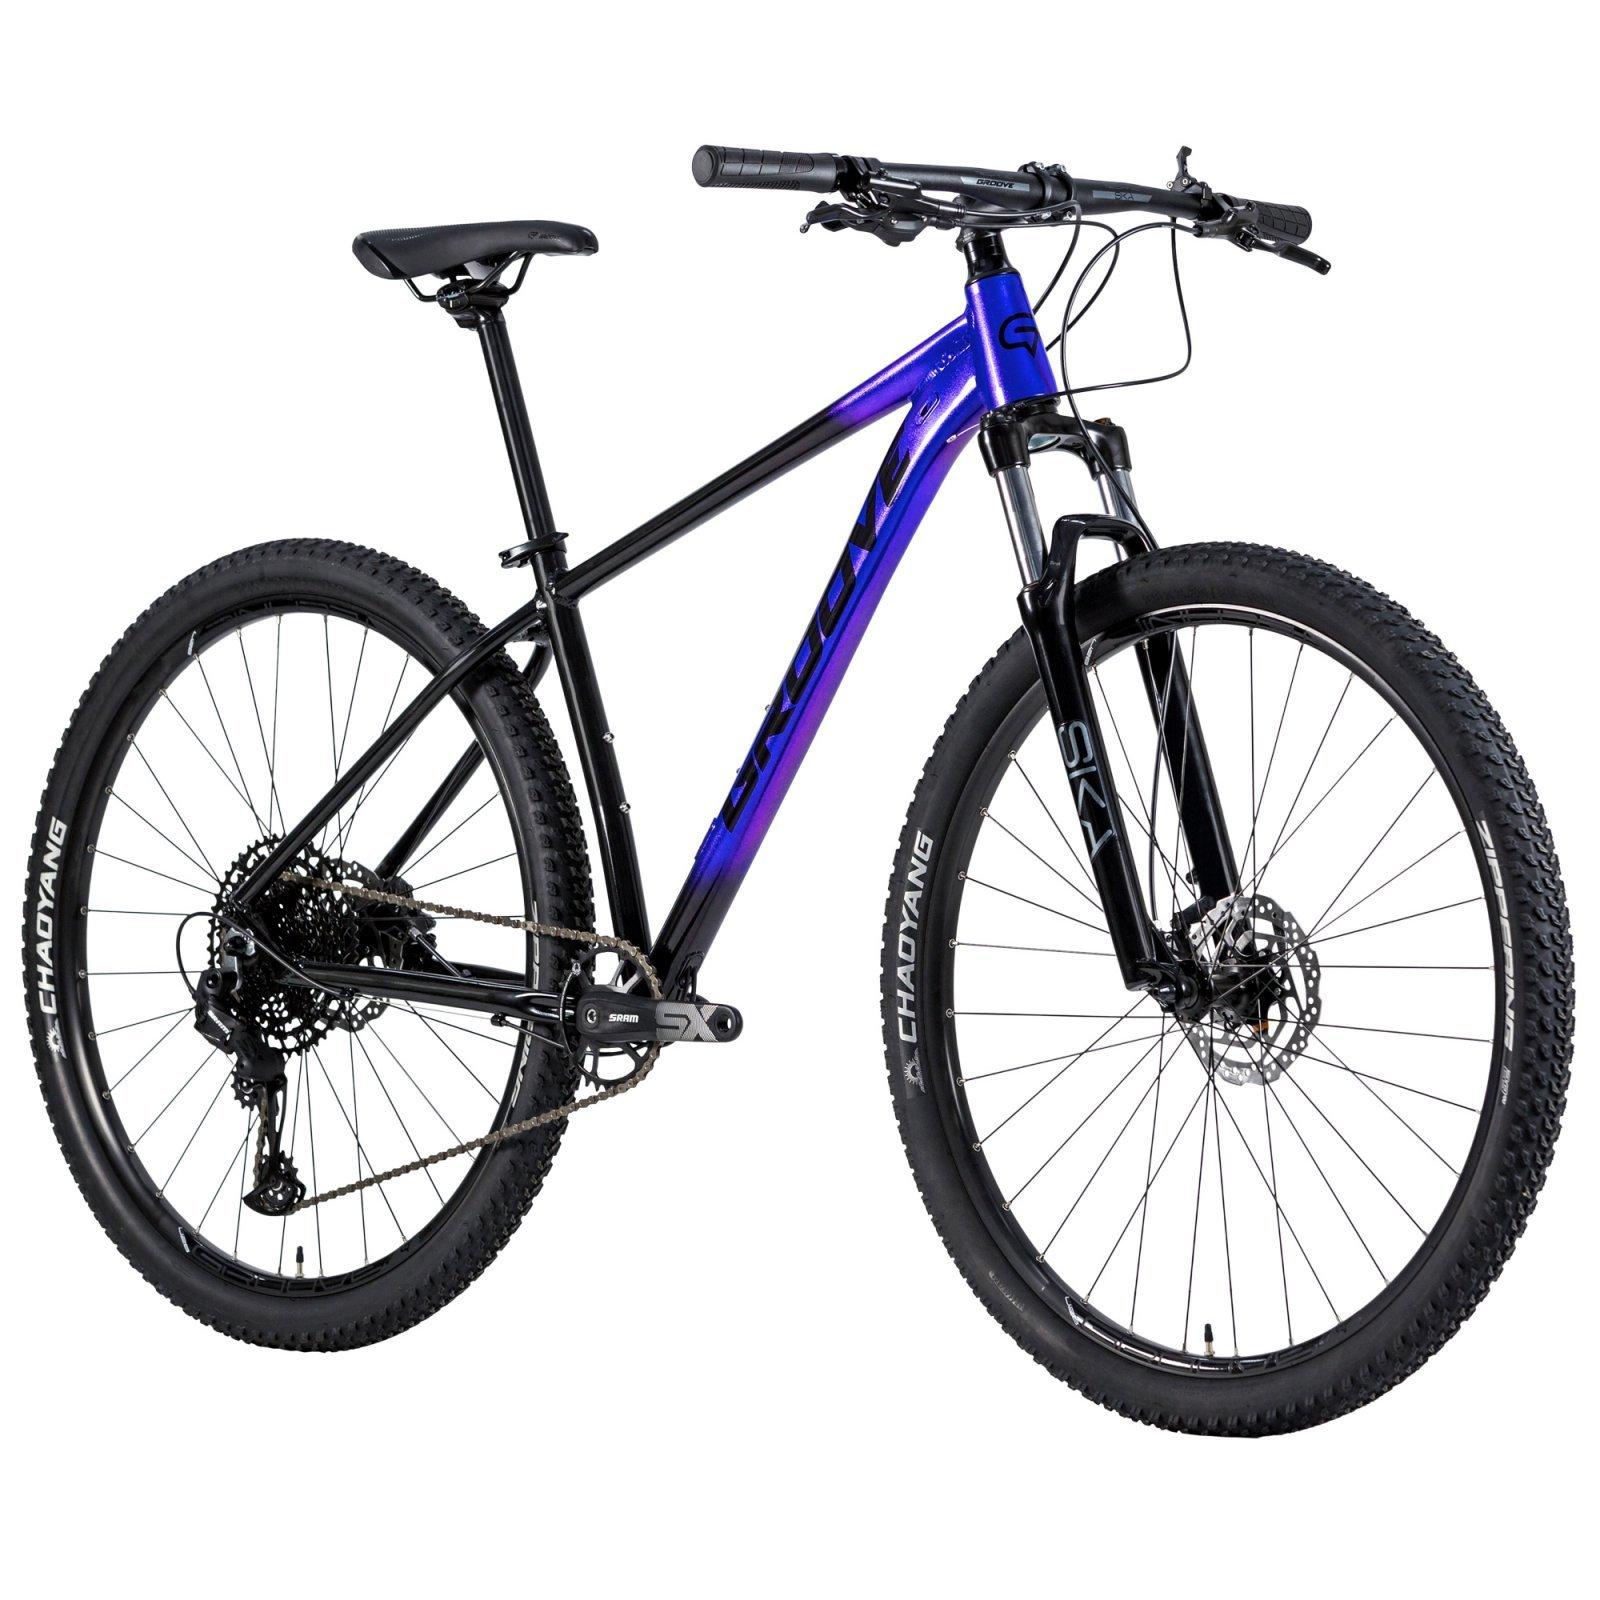 Bicicleta Groove Ska 50 Sram 12 vel - 2021